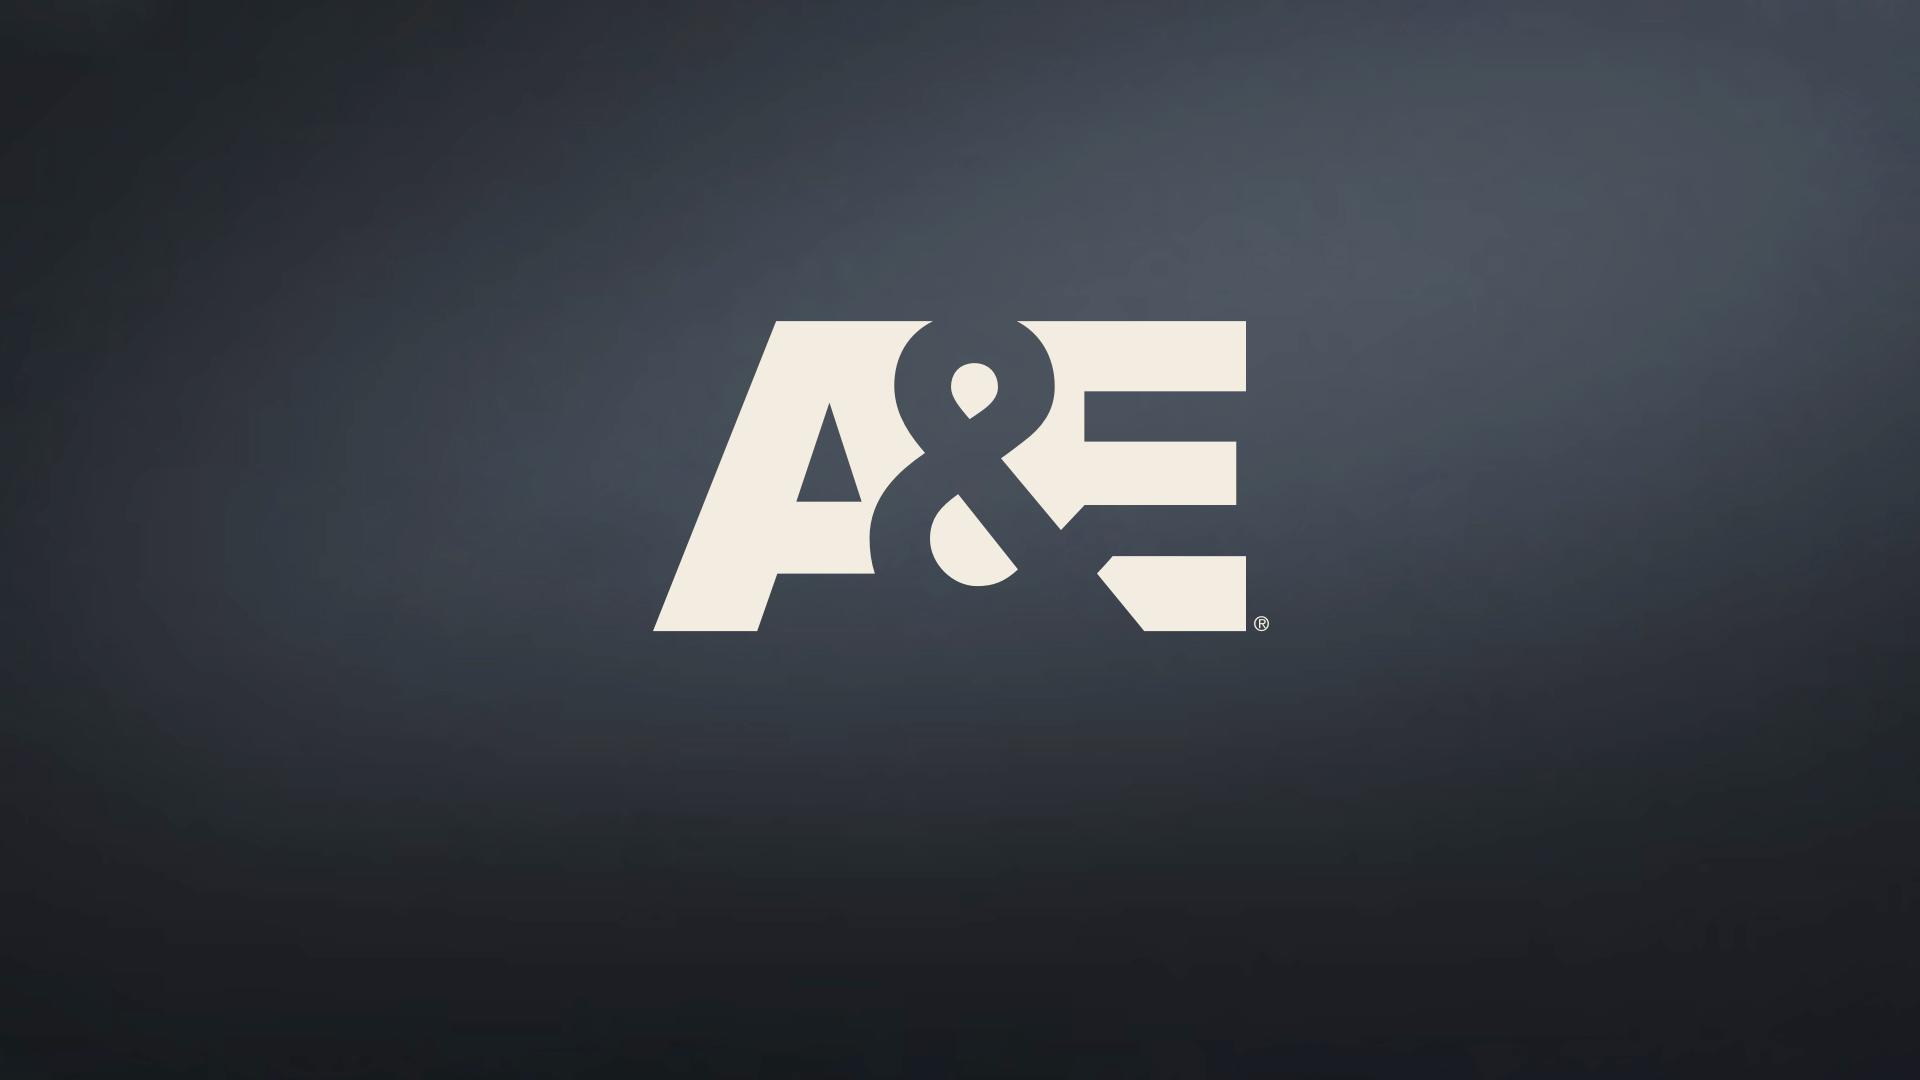 A & E | TV News 2017 | Hollywood News 2017